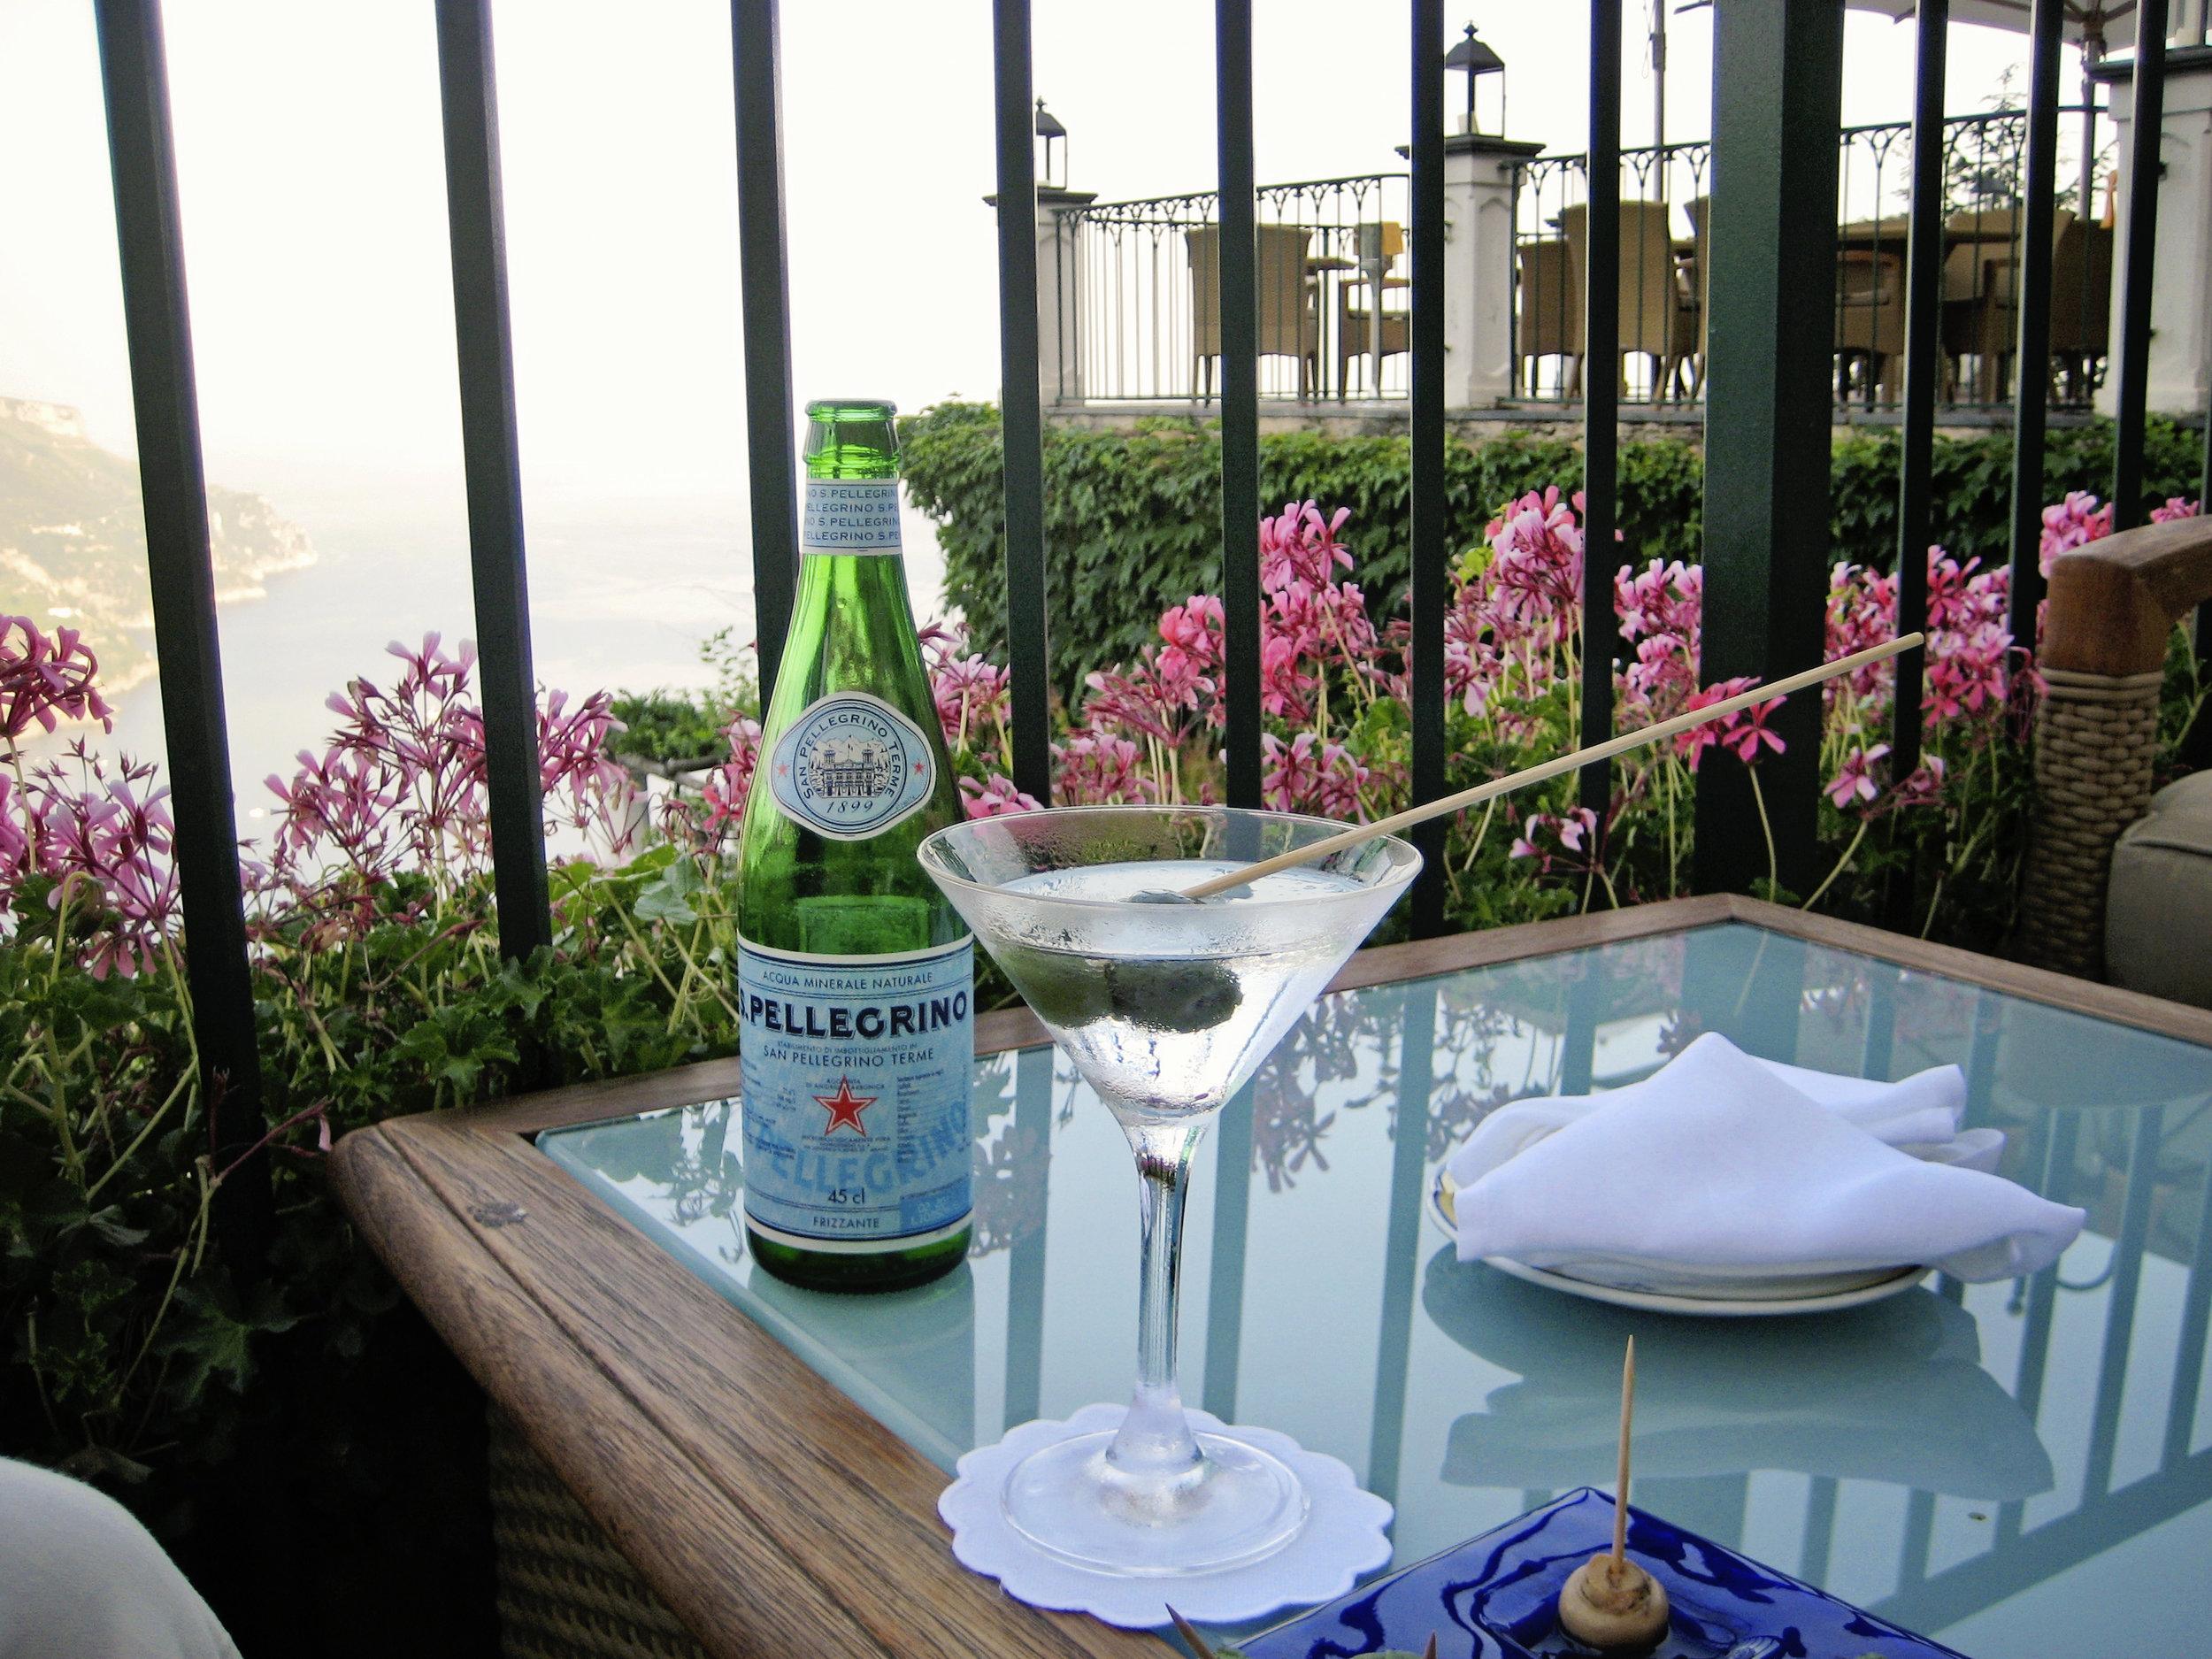 Martini with a View at Palazzo Avino Ravello, Italy